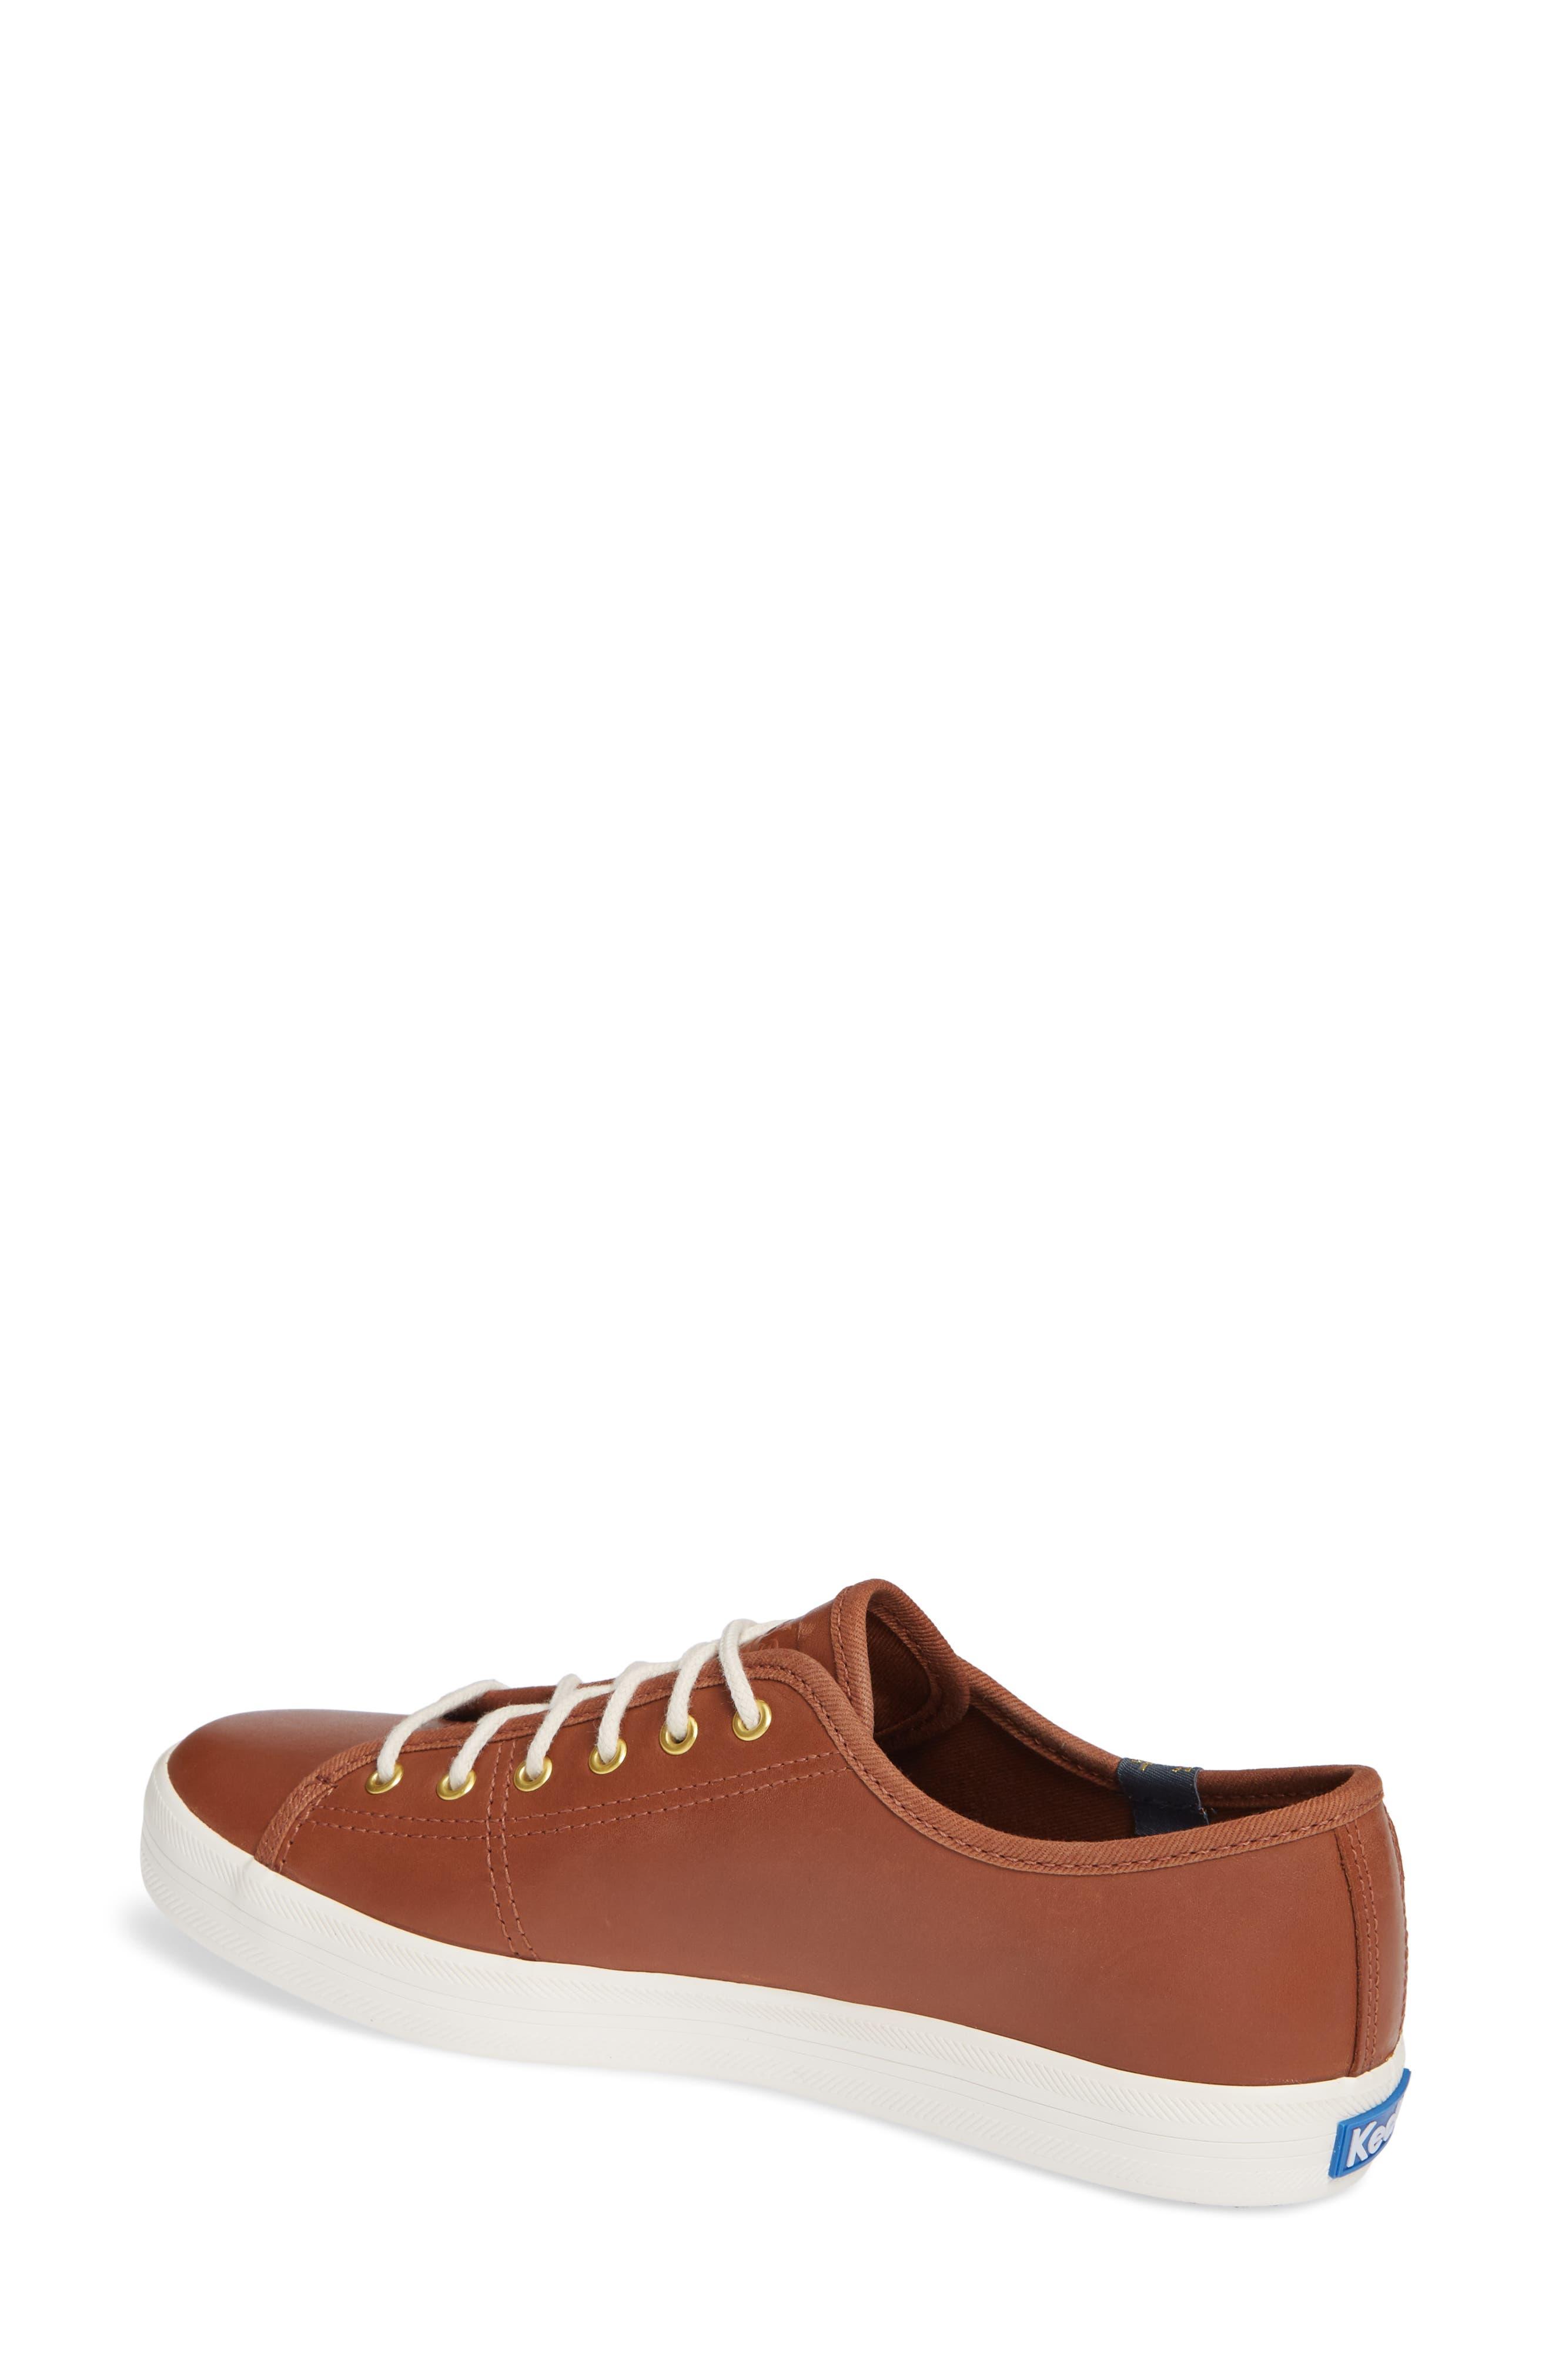 KEDS<SUP>®</SUP>, Kickstart Low Top Sneaker, Alternate thumbnail 2, color, COGNAC